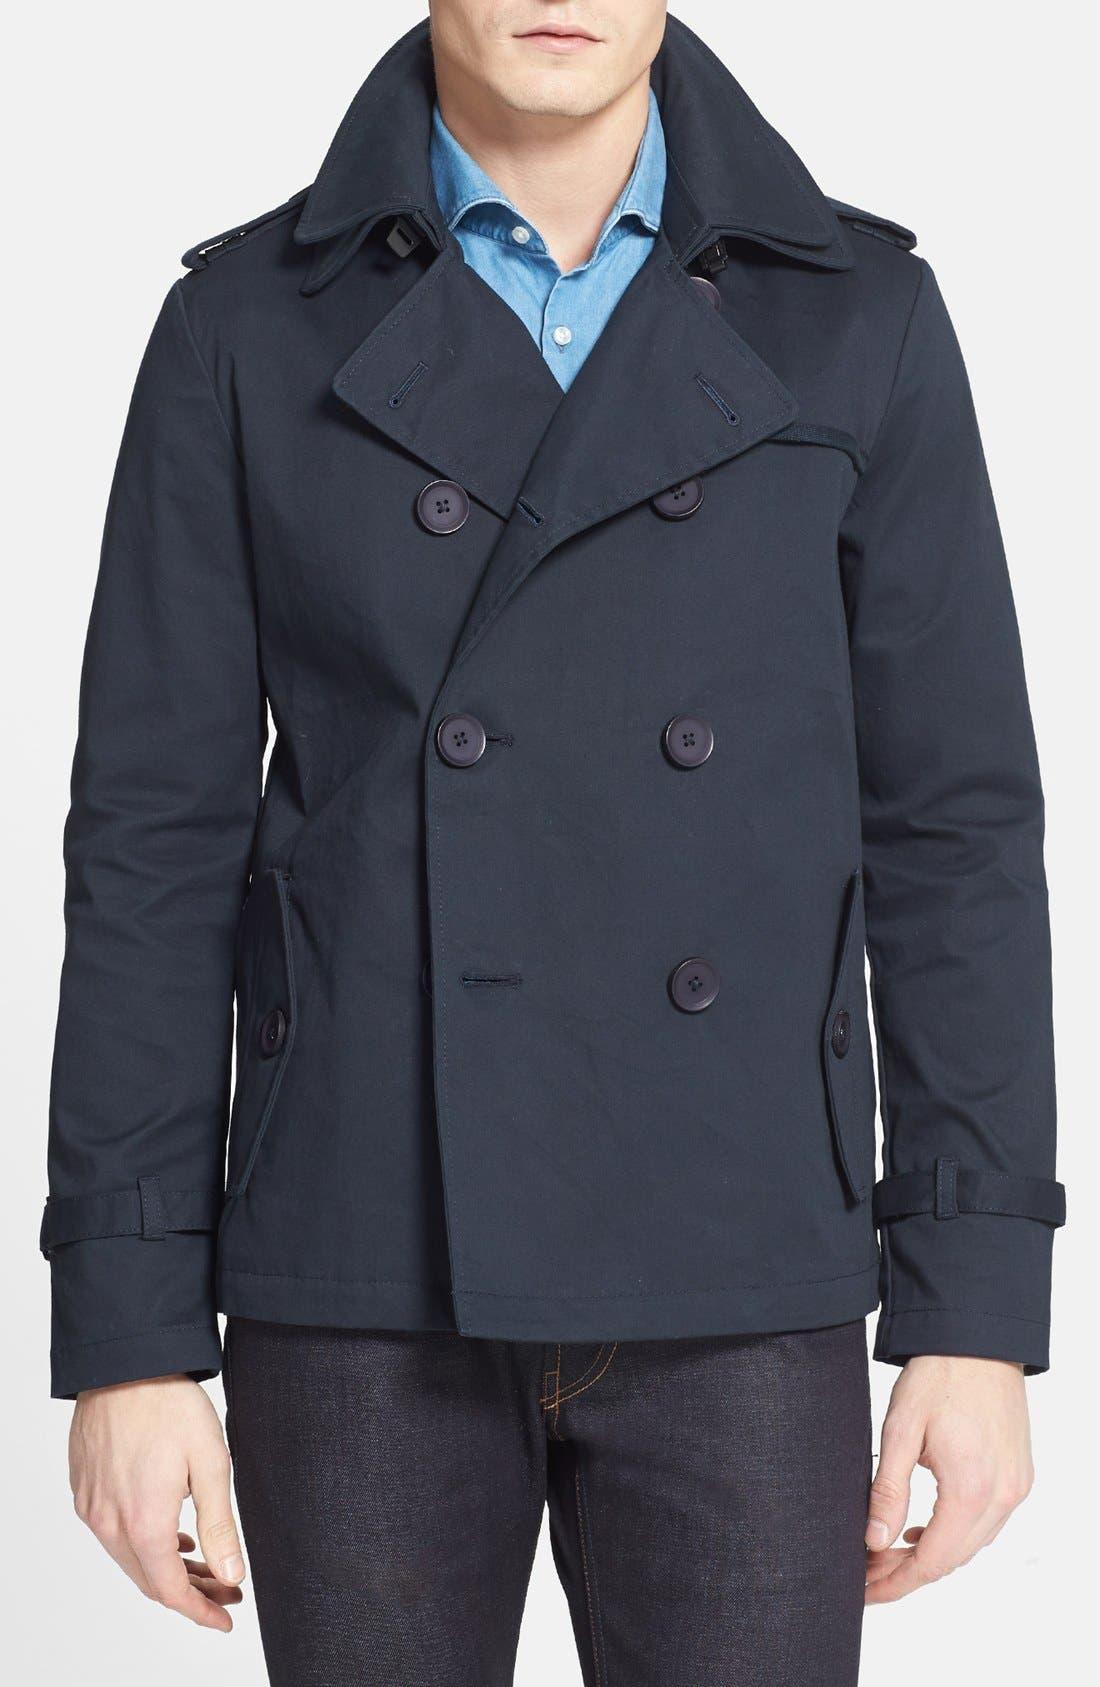 Main Image - Moods of Norway 'Jan Engil' Double Breasted Cotton Jacket